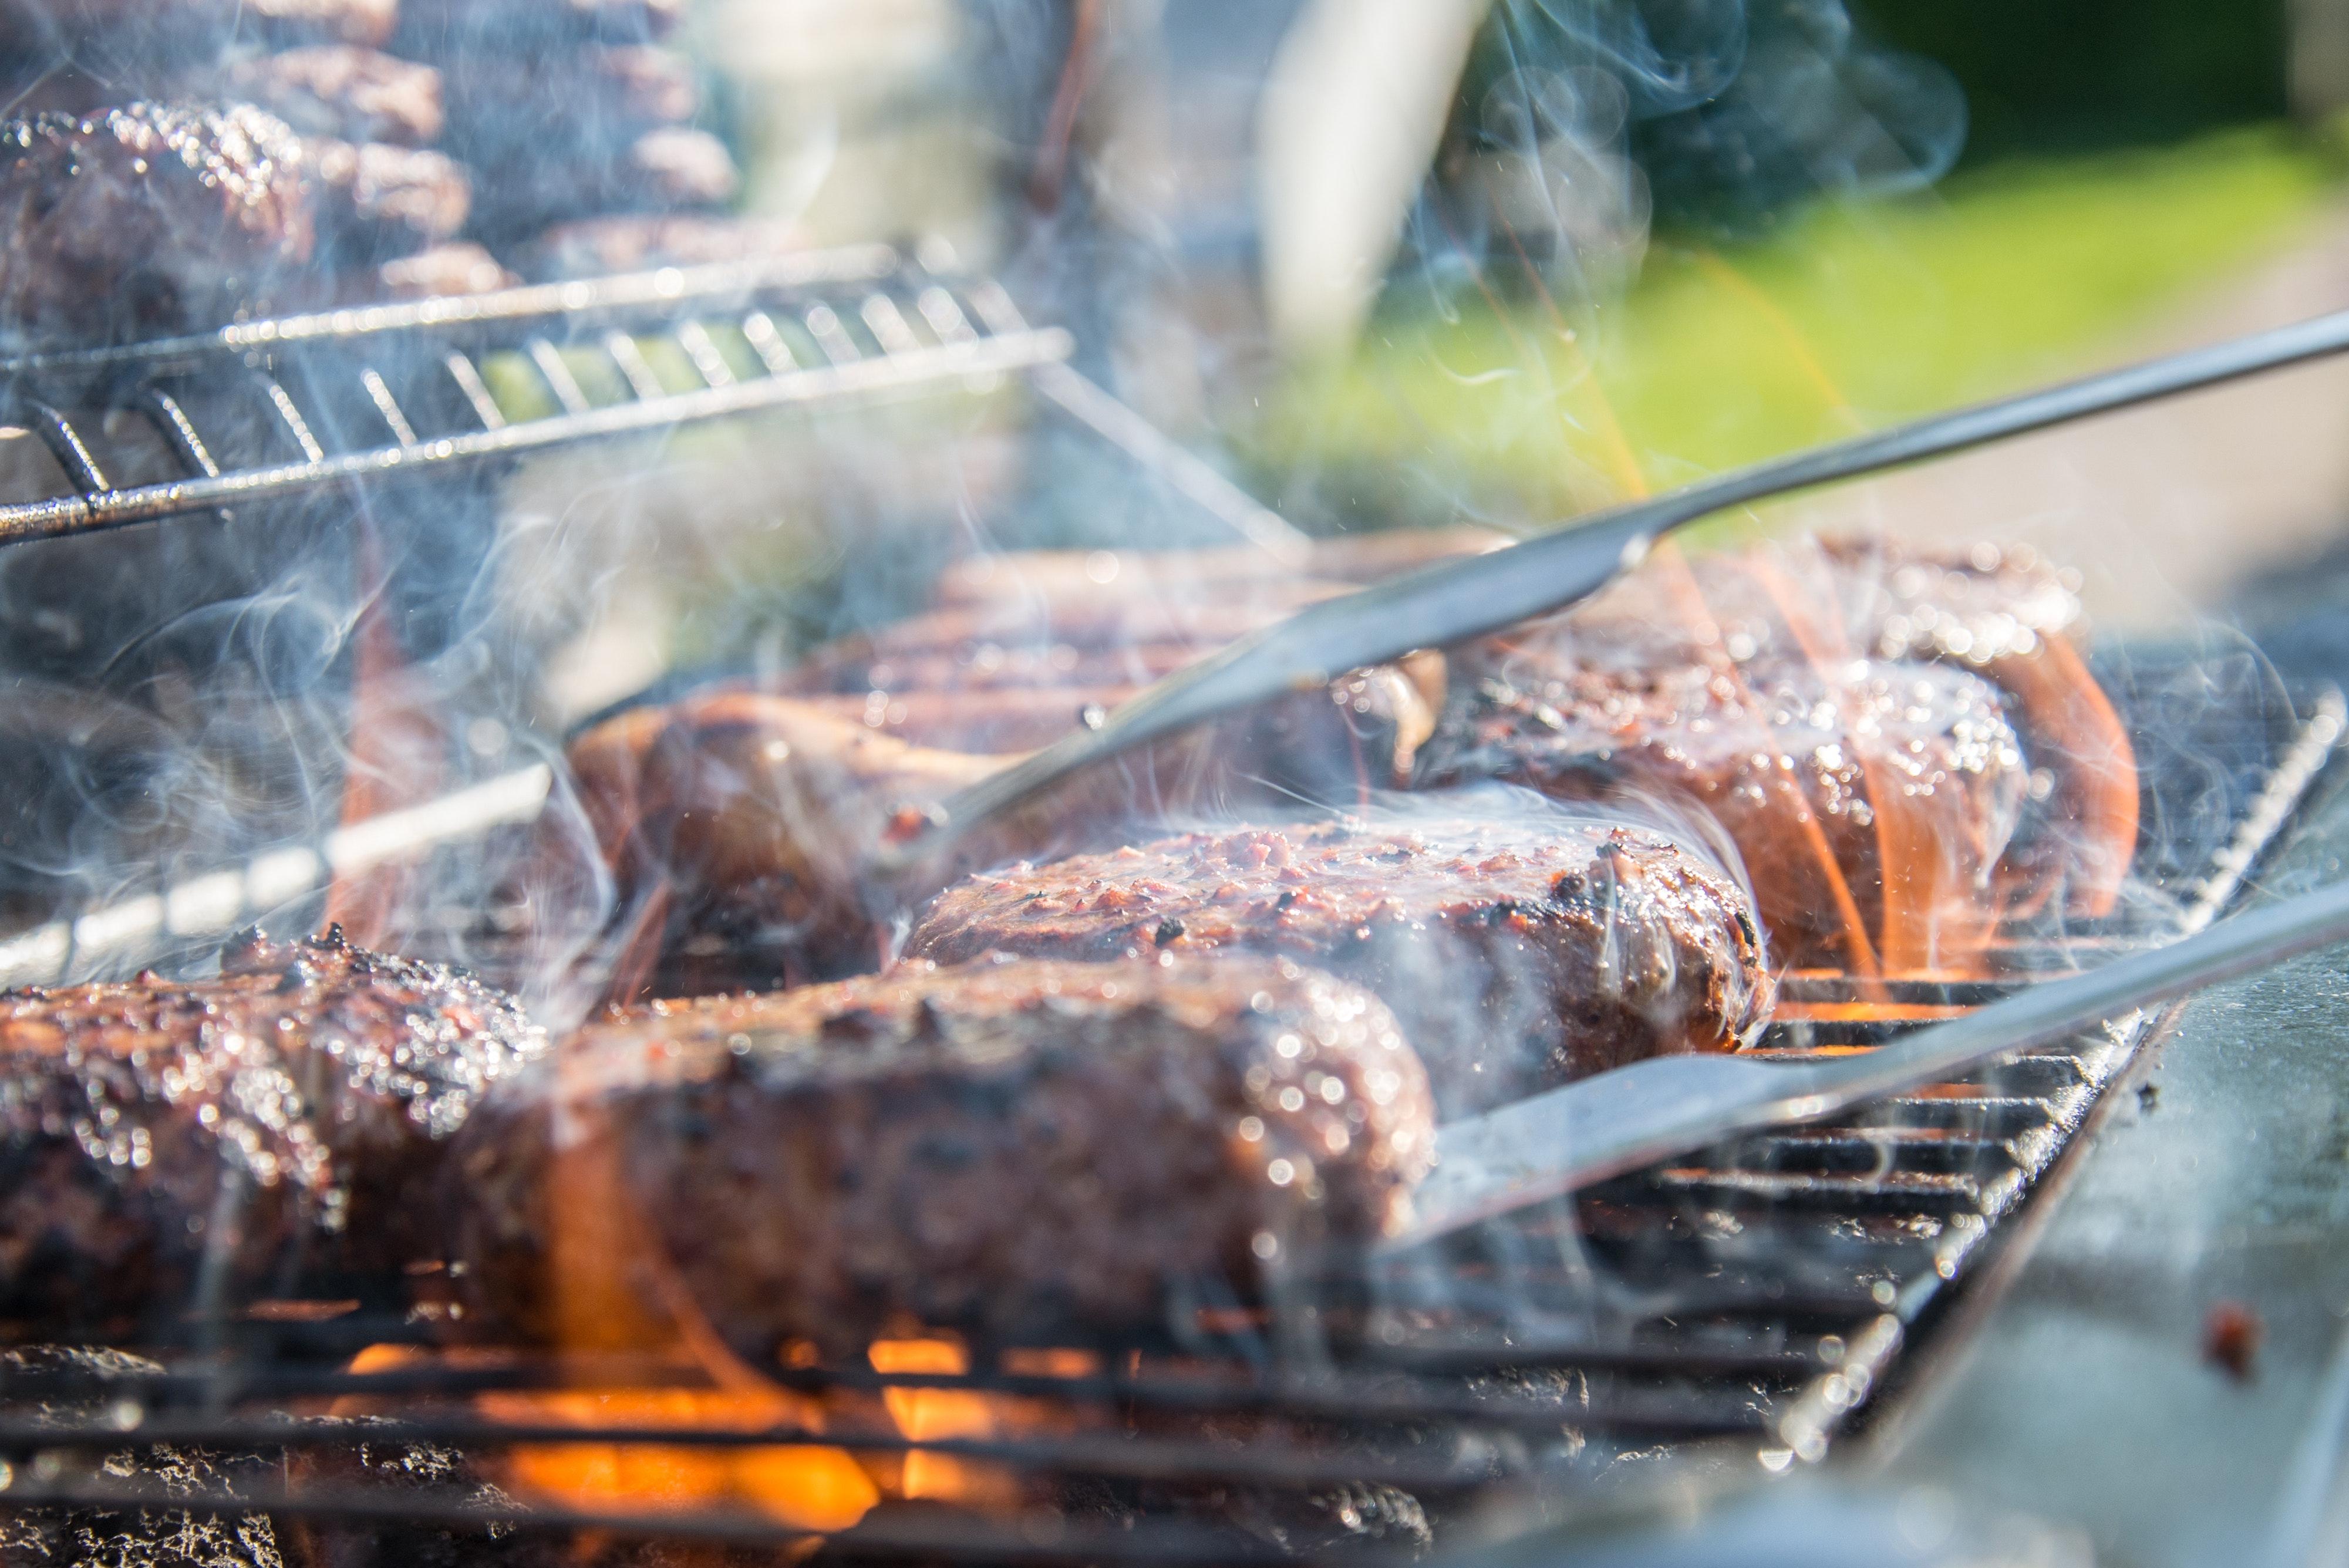 Nicaragua exportó el 82% de la carne de Centroamérica en 2018